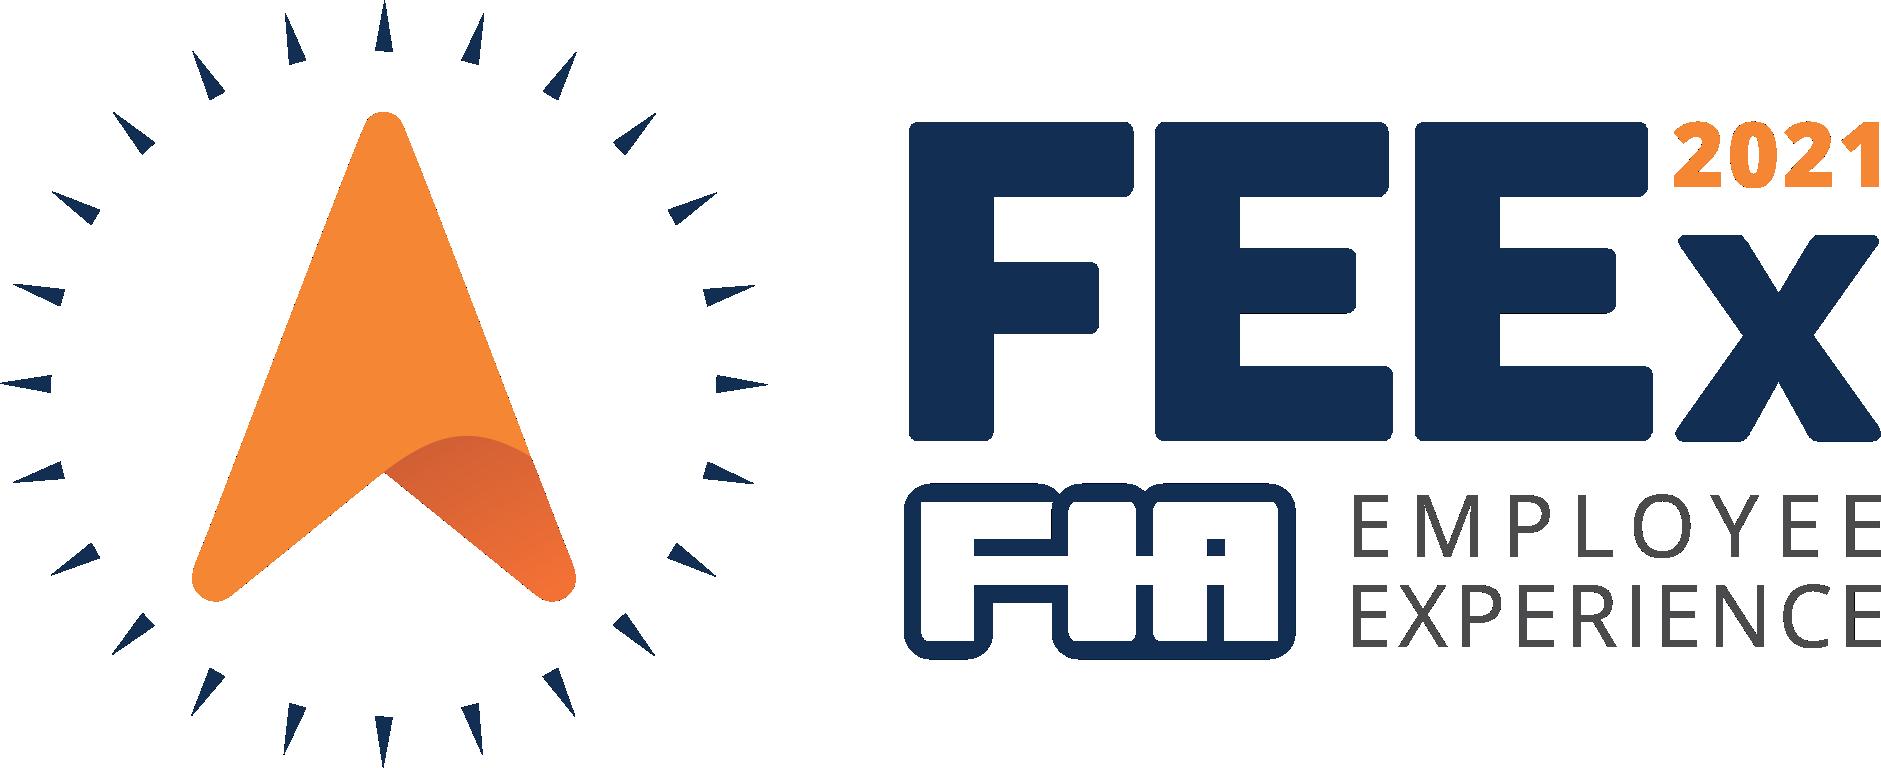 FEEx 2021 | FIA Employee Experience